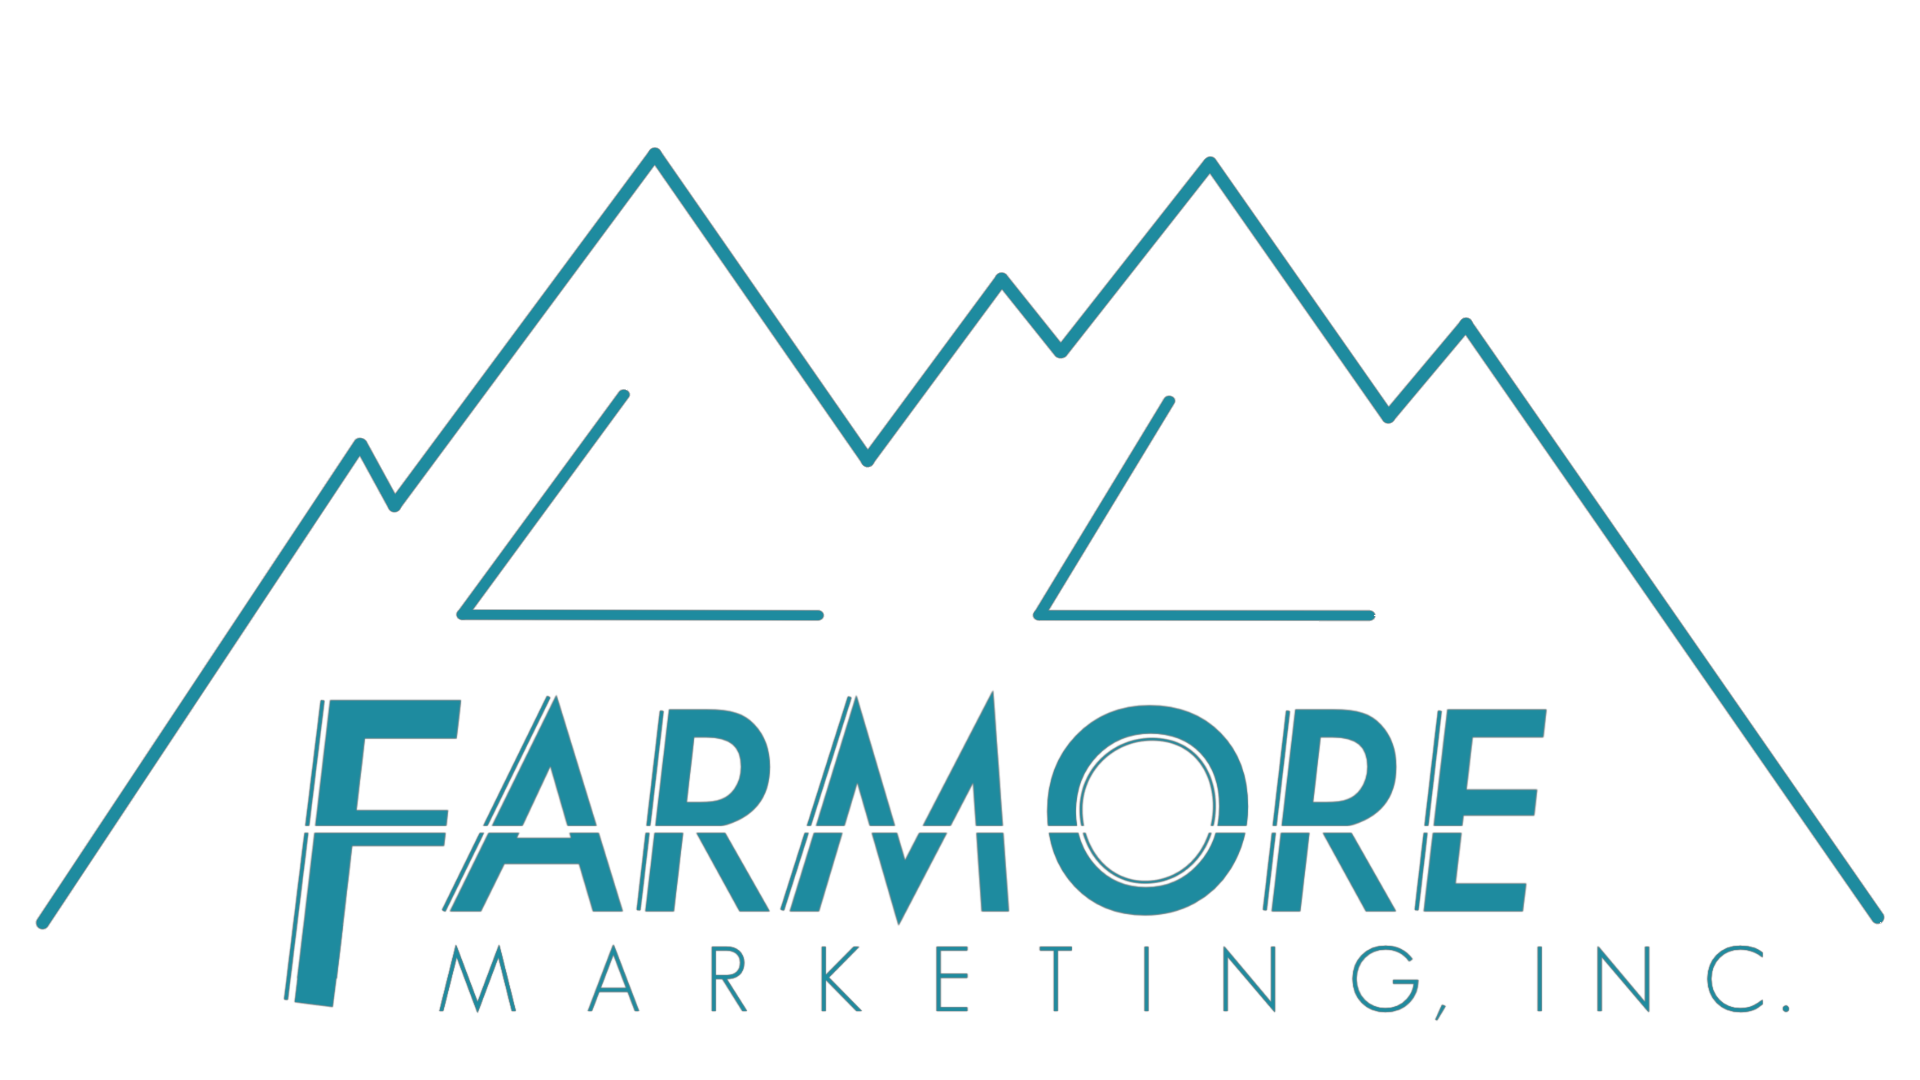 Farmore Marketing.jpg